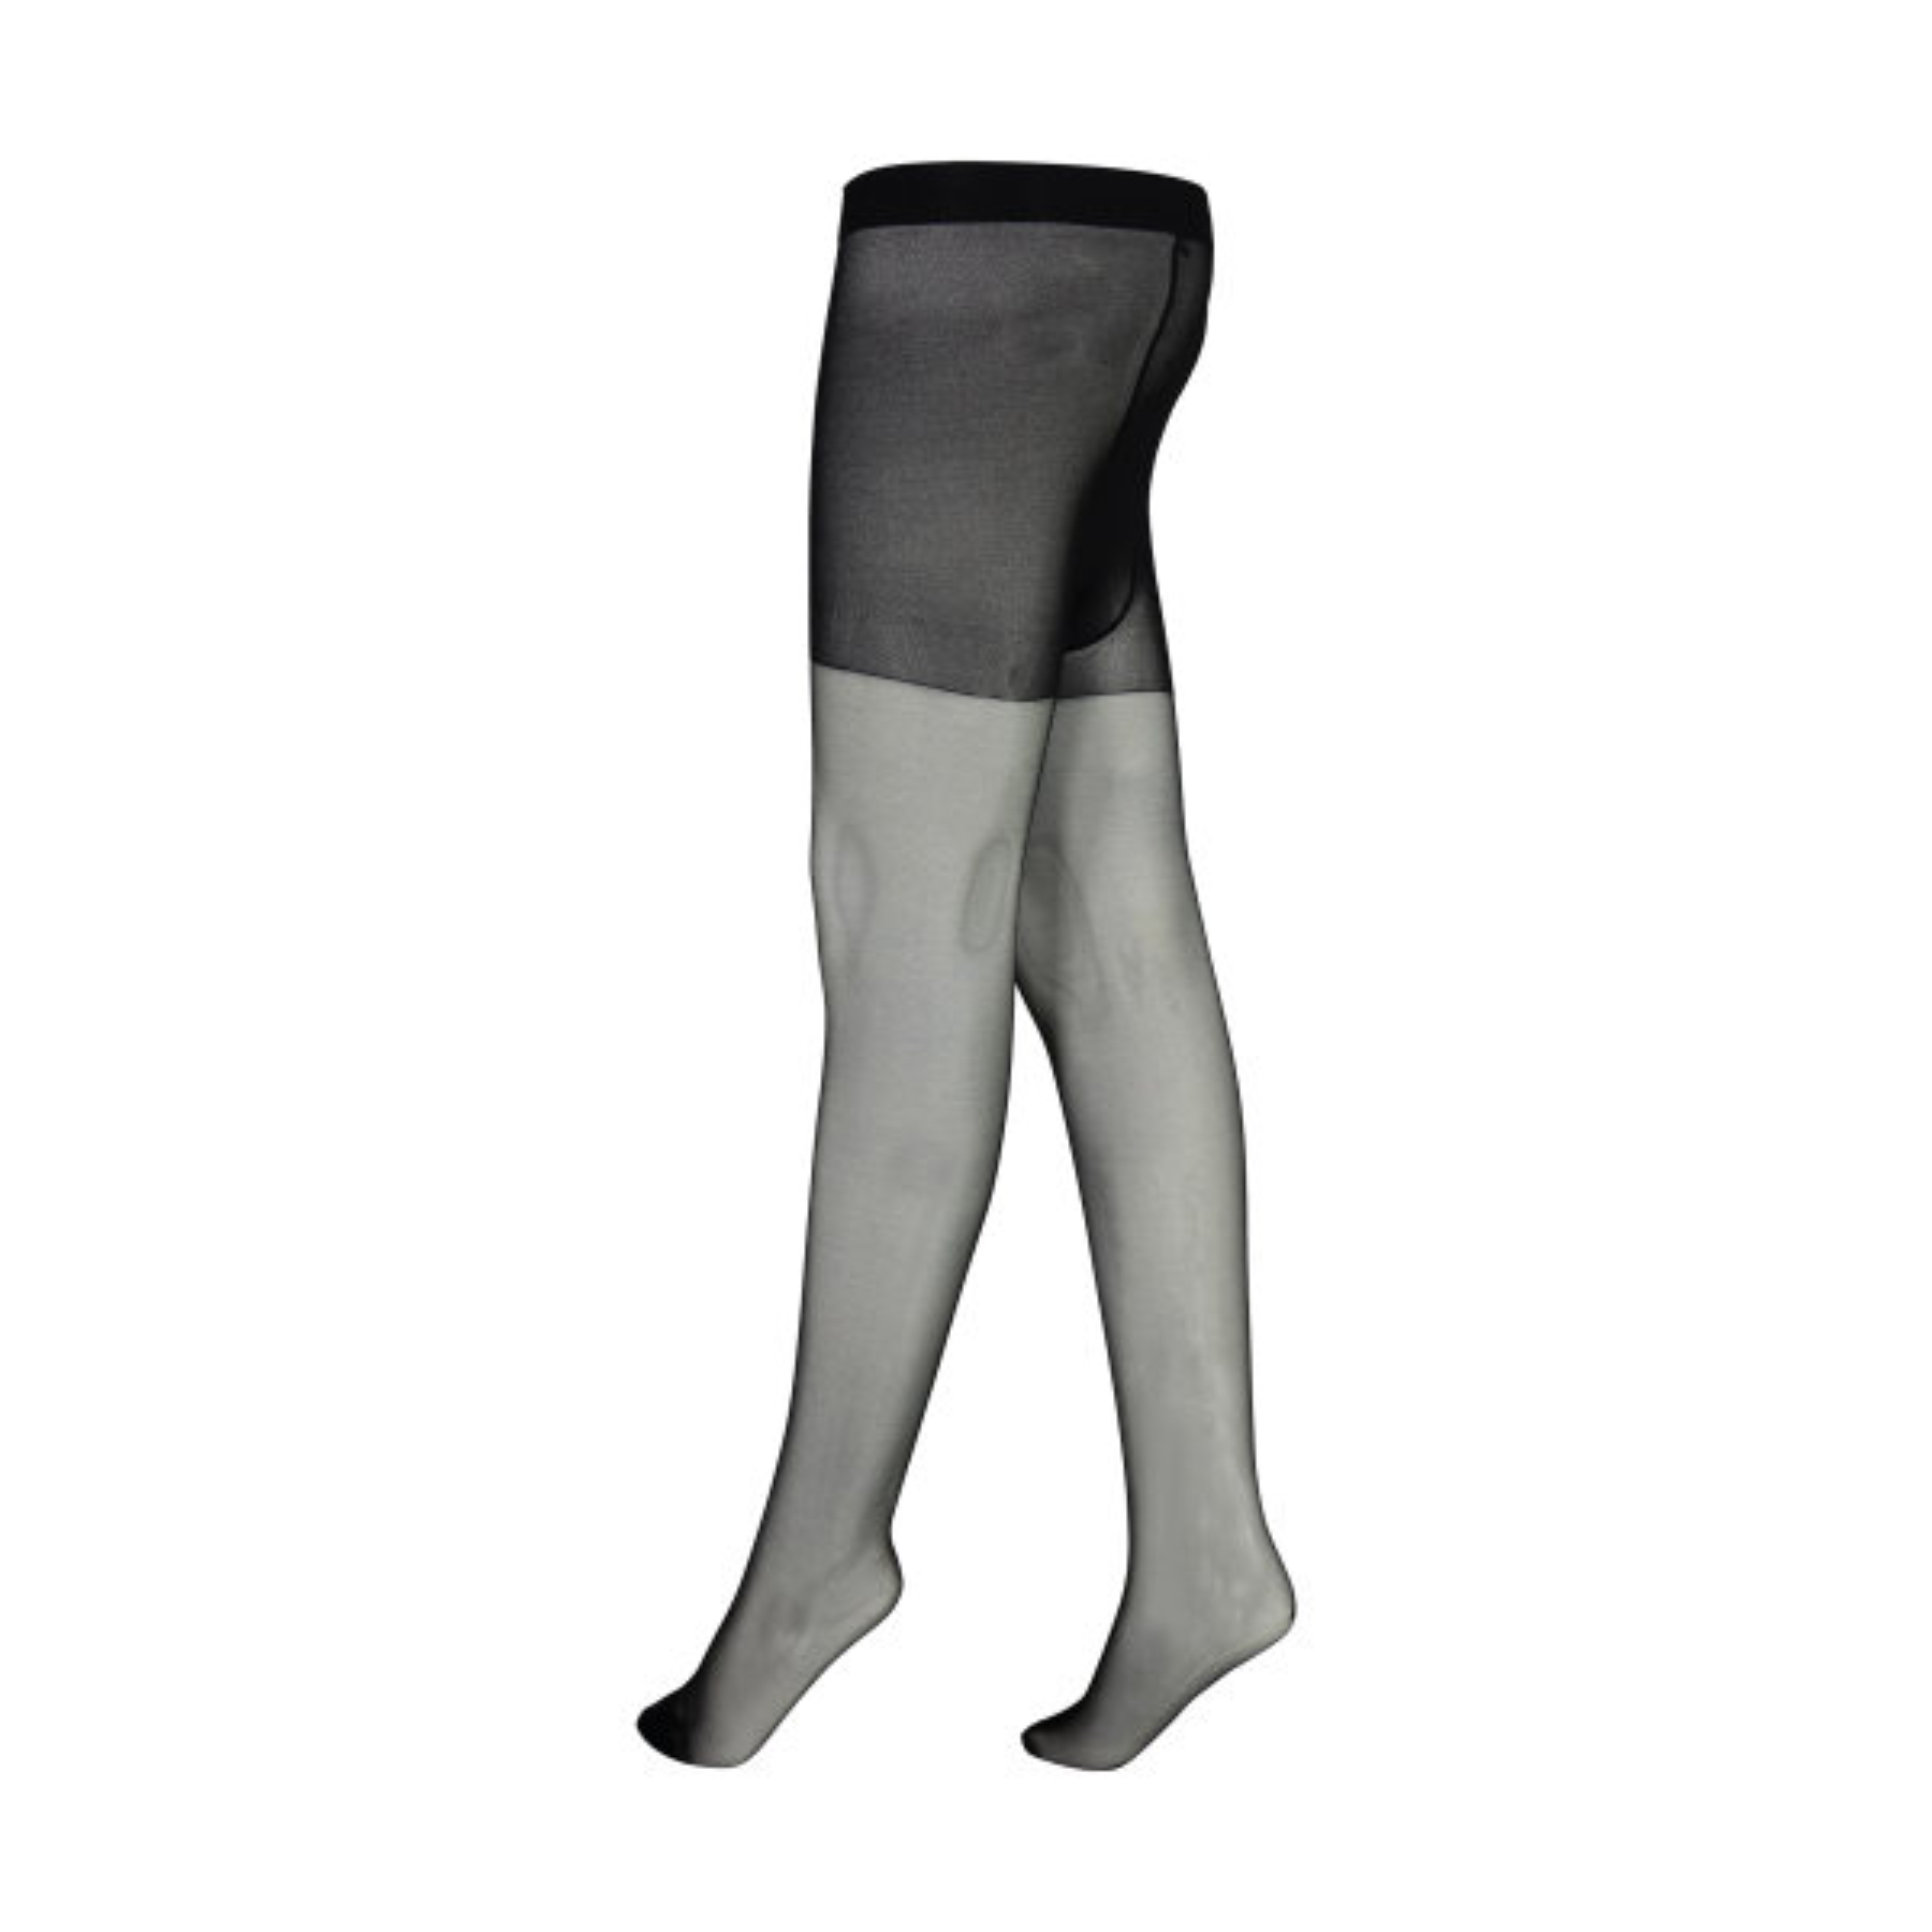 جوراب شلواری زنانه پنتی مدل 10D